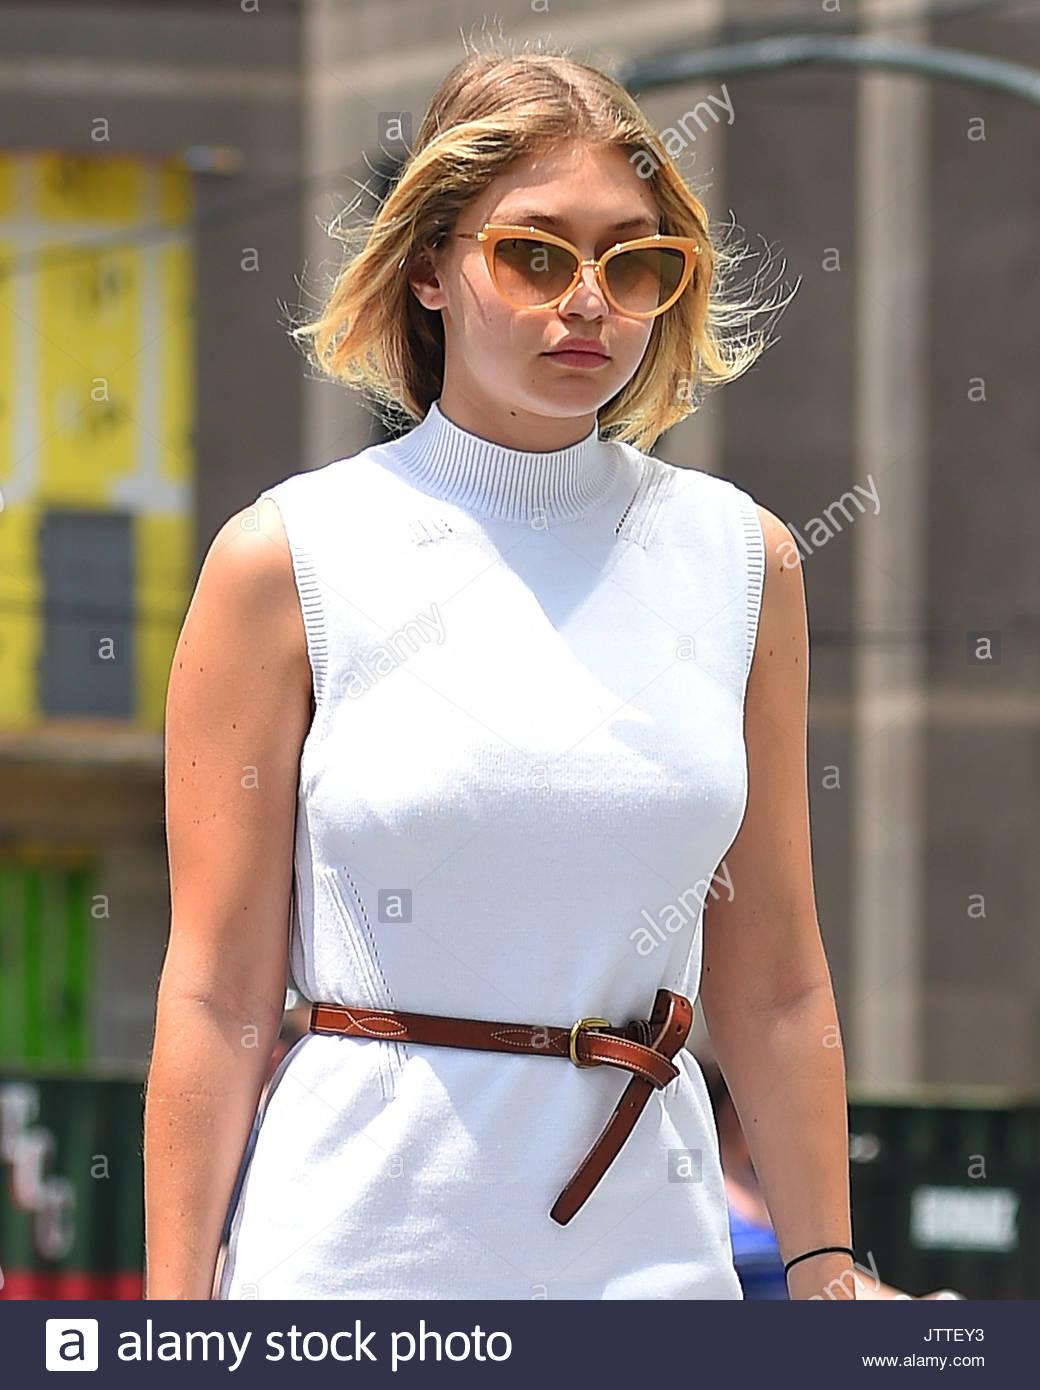 3249dbdf0987 Gigi Hadid porte une robe blanche et marron ceinture en balade à New York  City